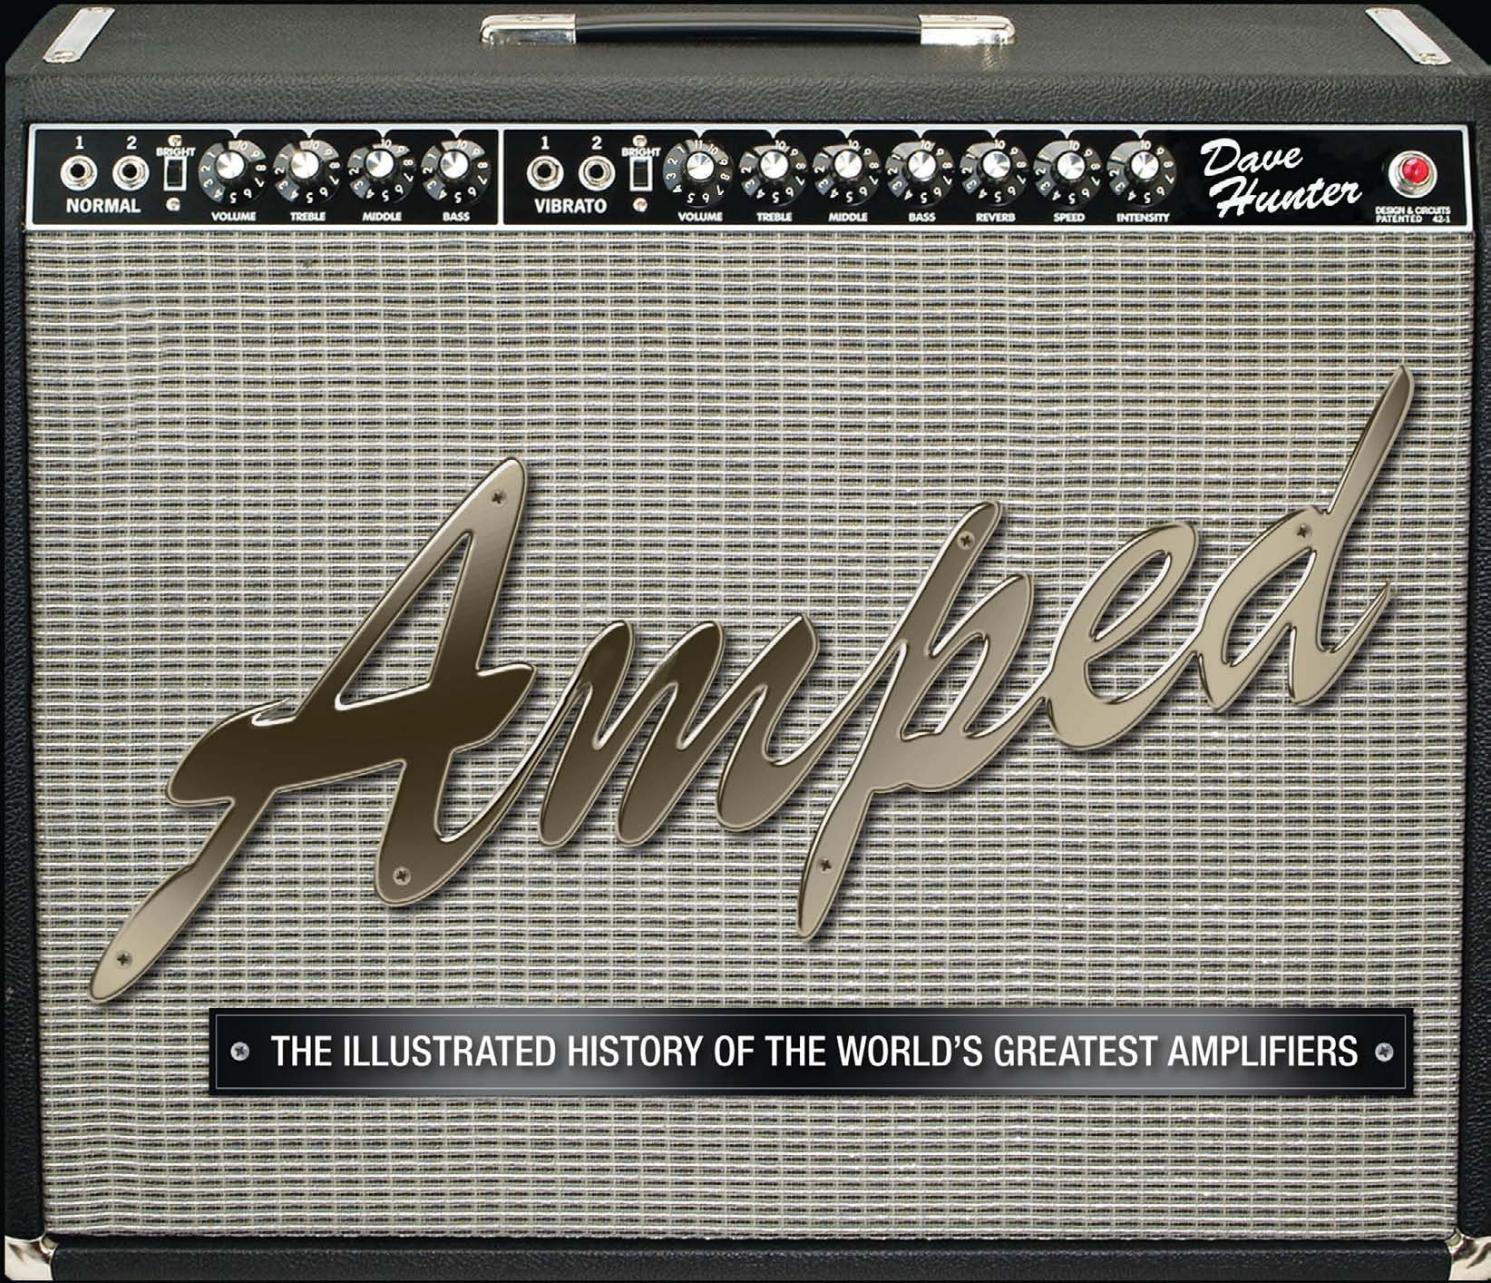 Jensen speaker codes vintage identification The Fender